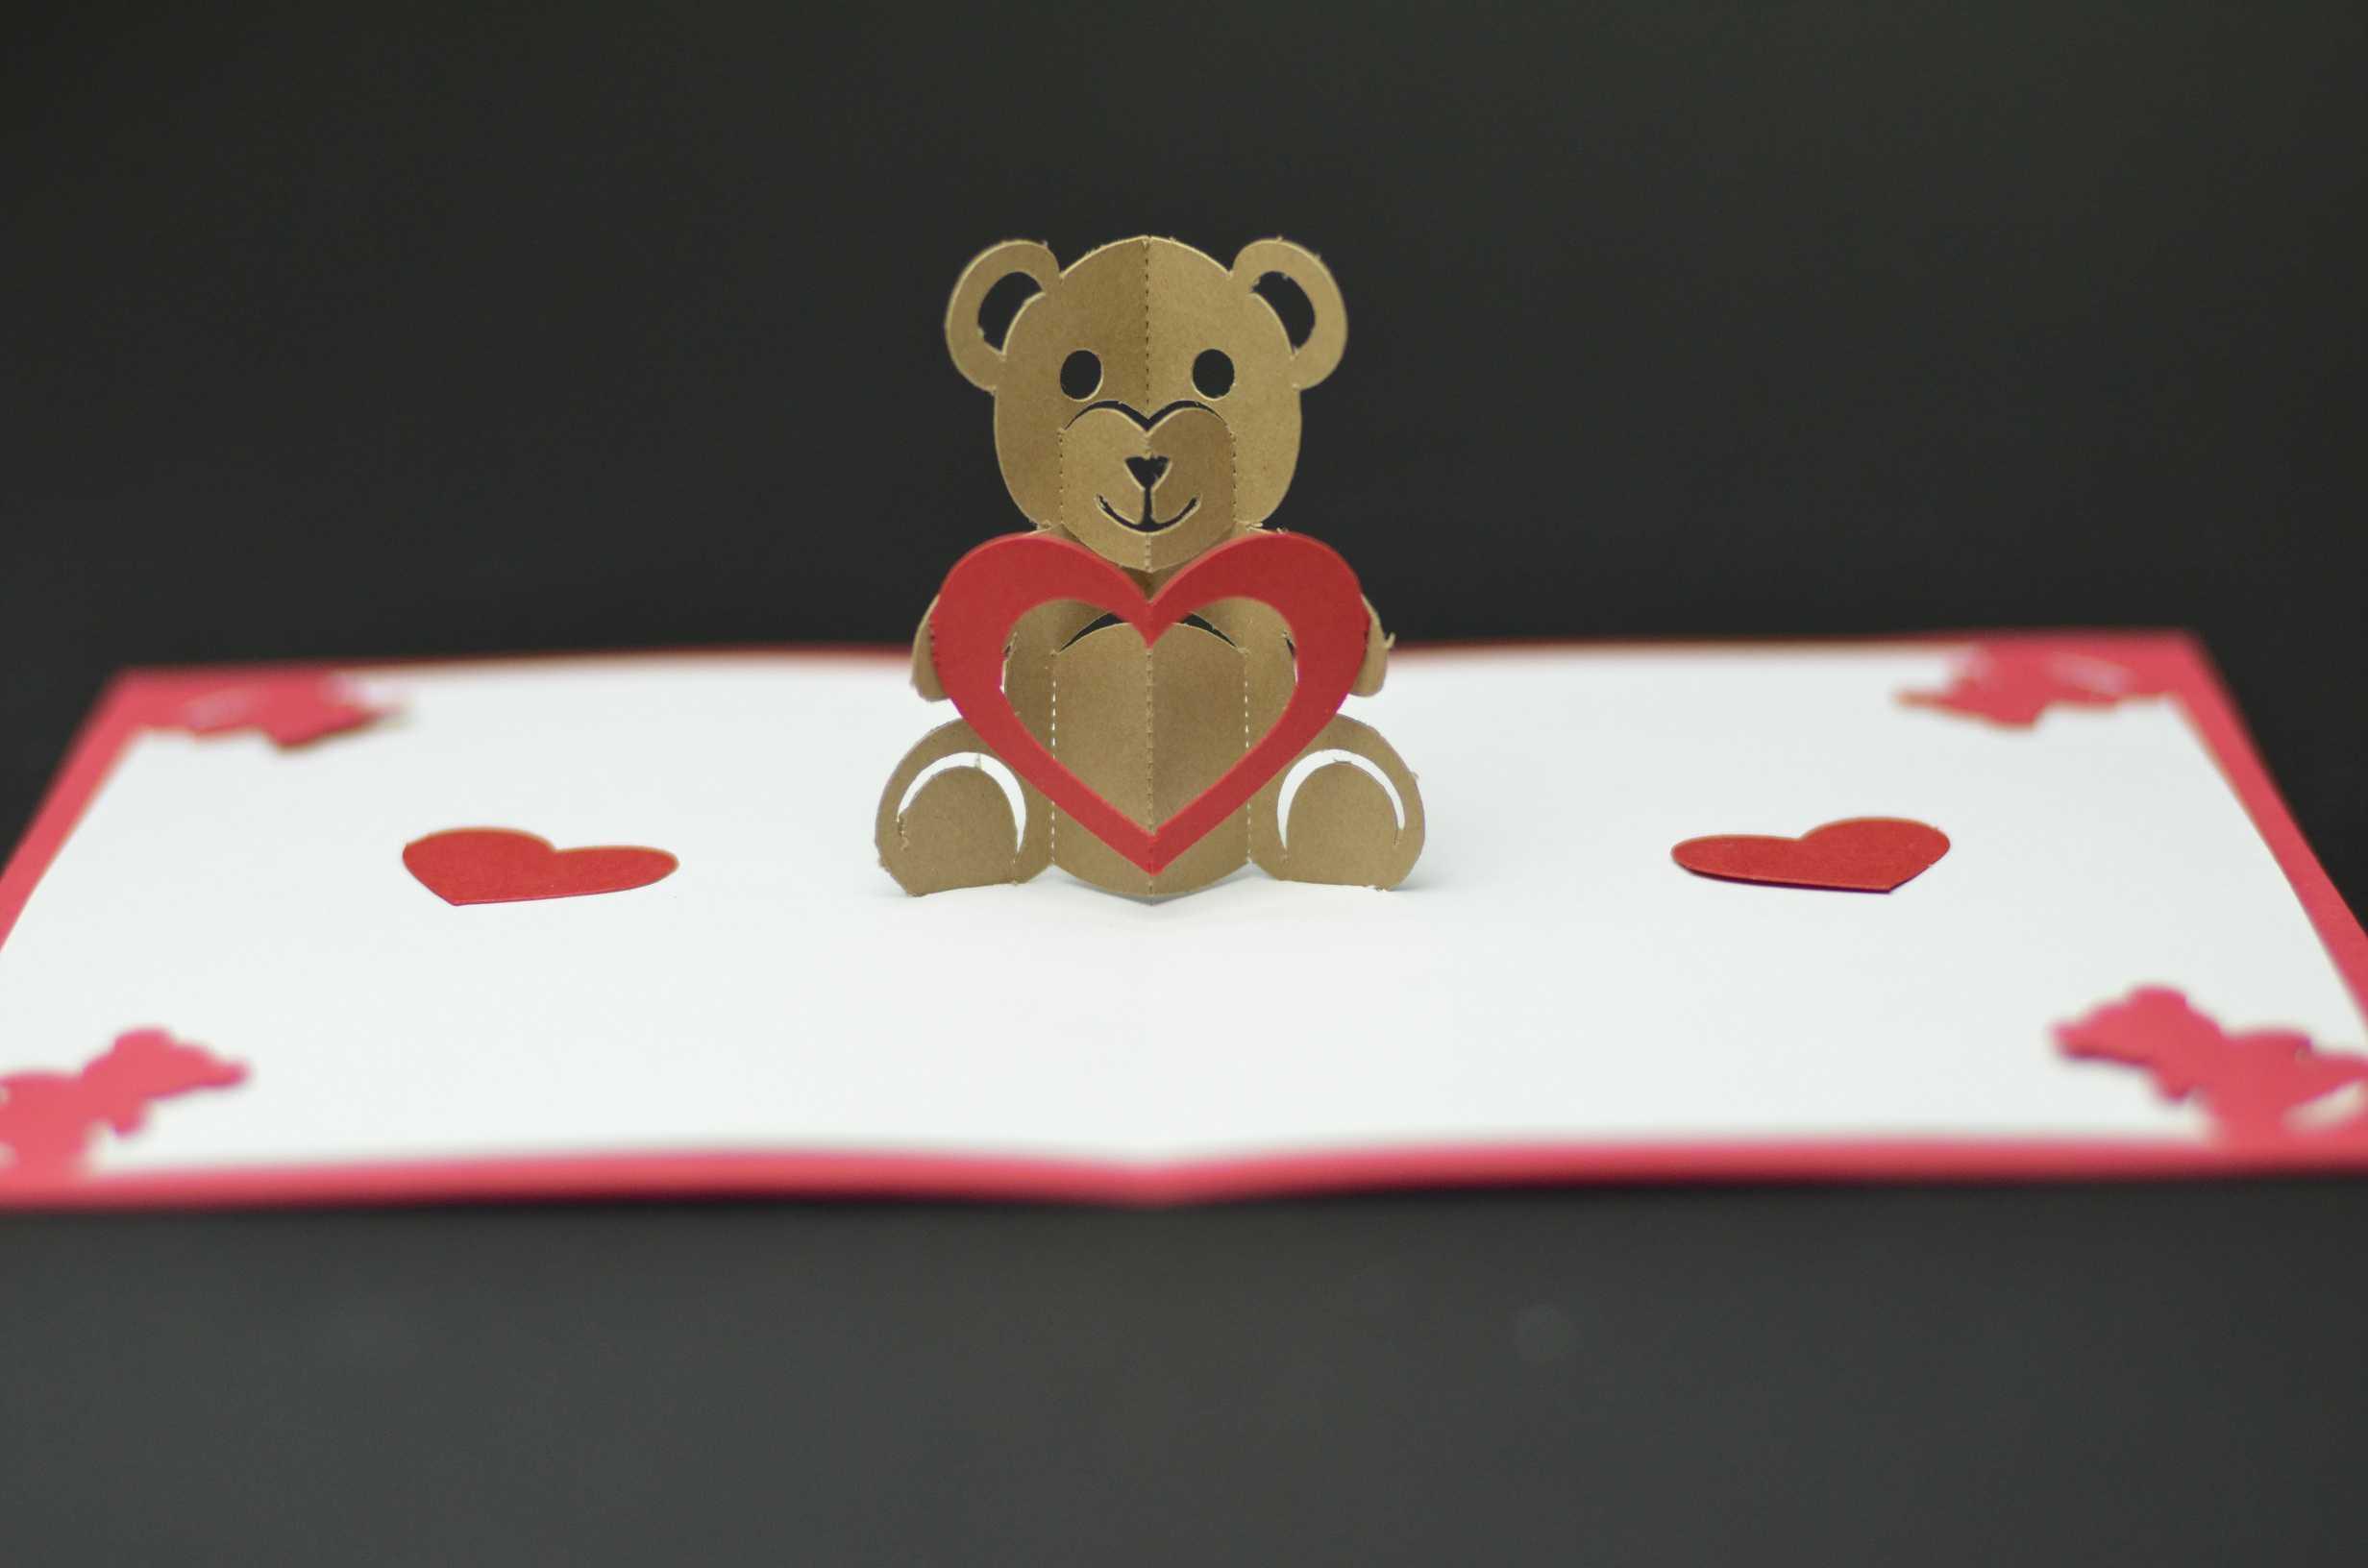 Pop Up Card Tutorials And Templates - Creative Pop Up Cards With Popup Card Template Free